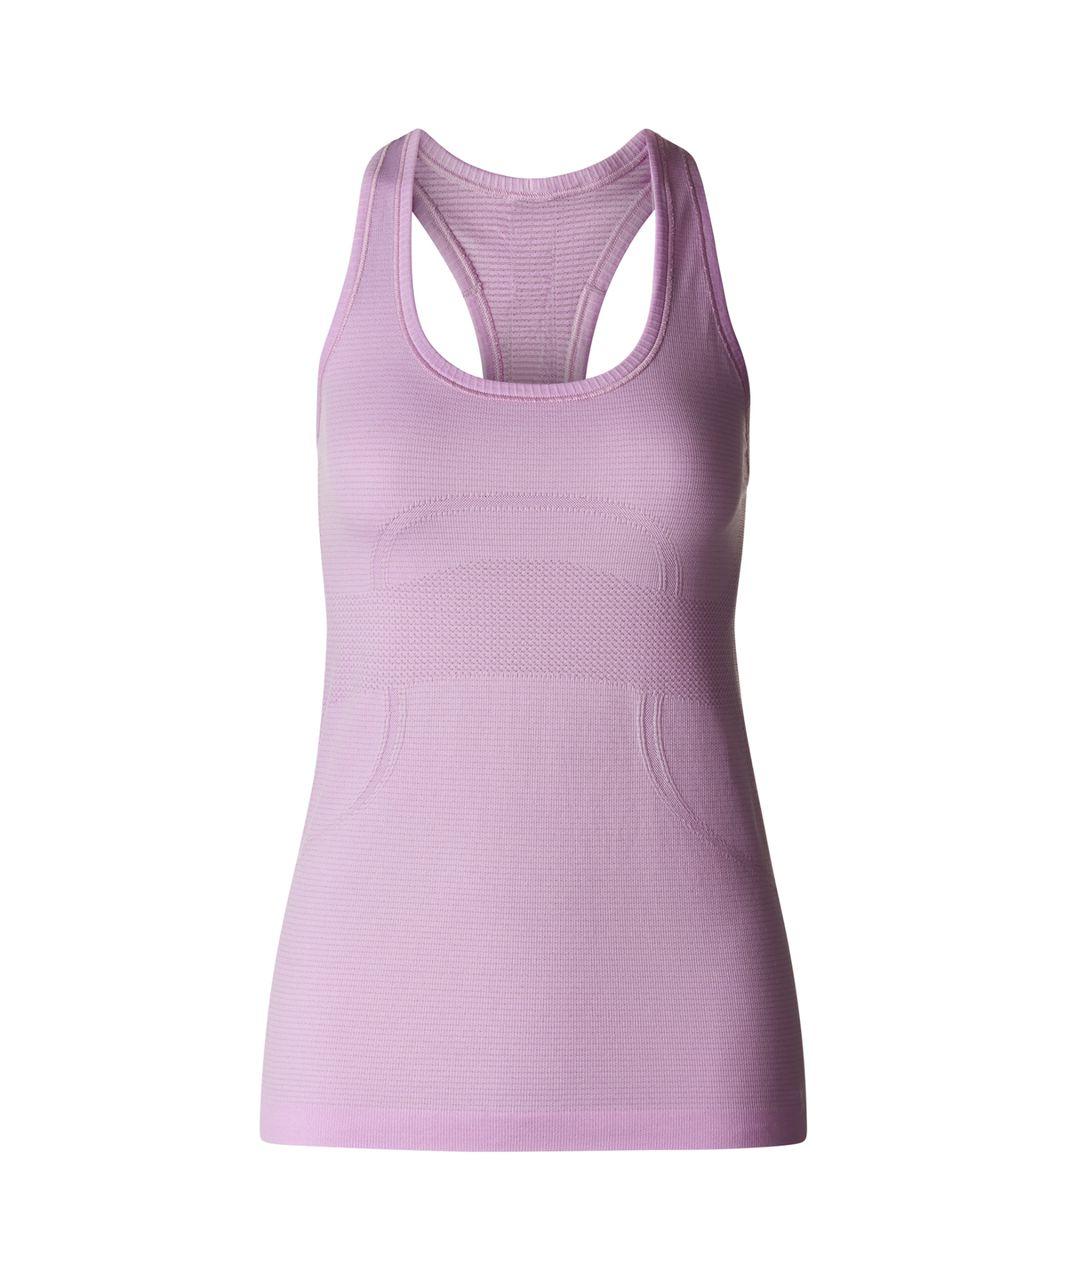 Lululemon Swiftly Tech Racerback - Heathered Pretty Purple